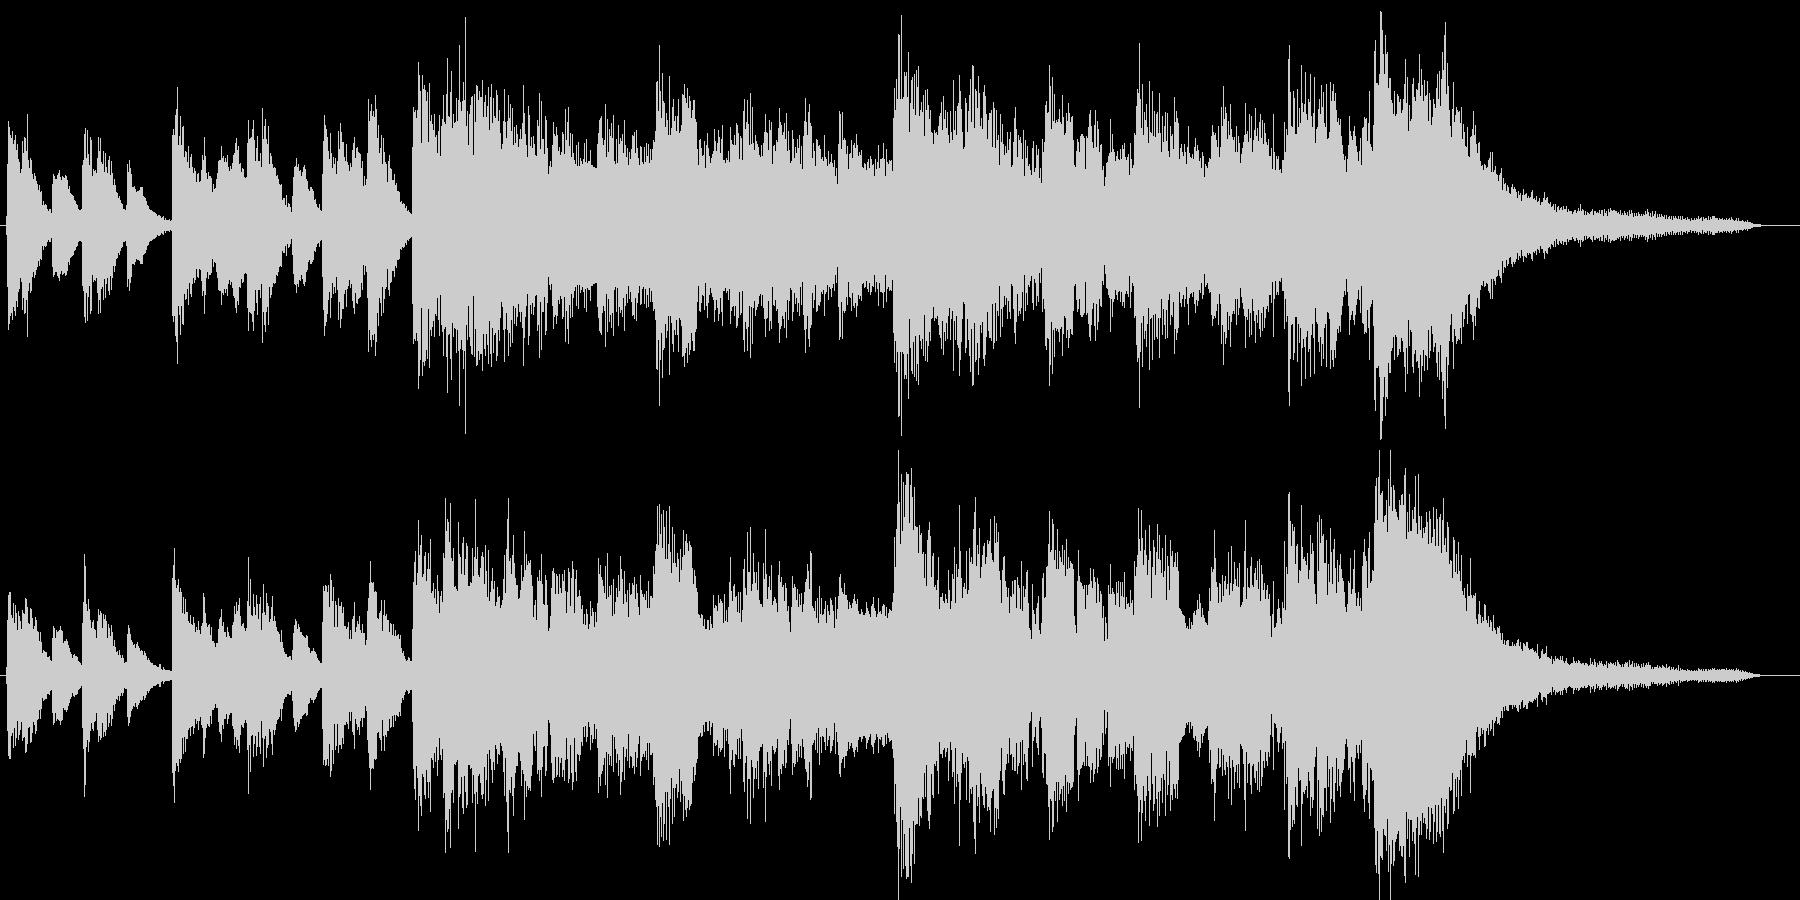 JAZZピアノサックスレトロ企業VPの未再生の波形